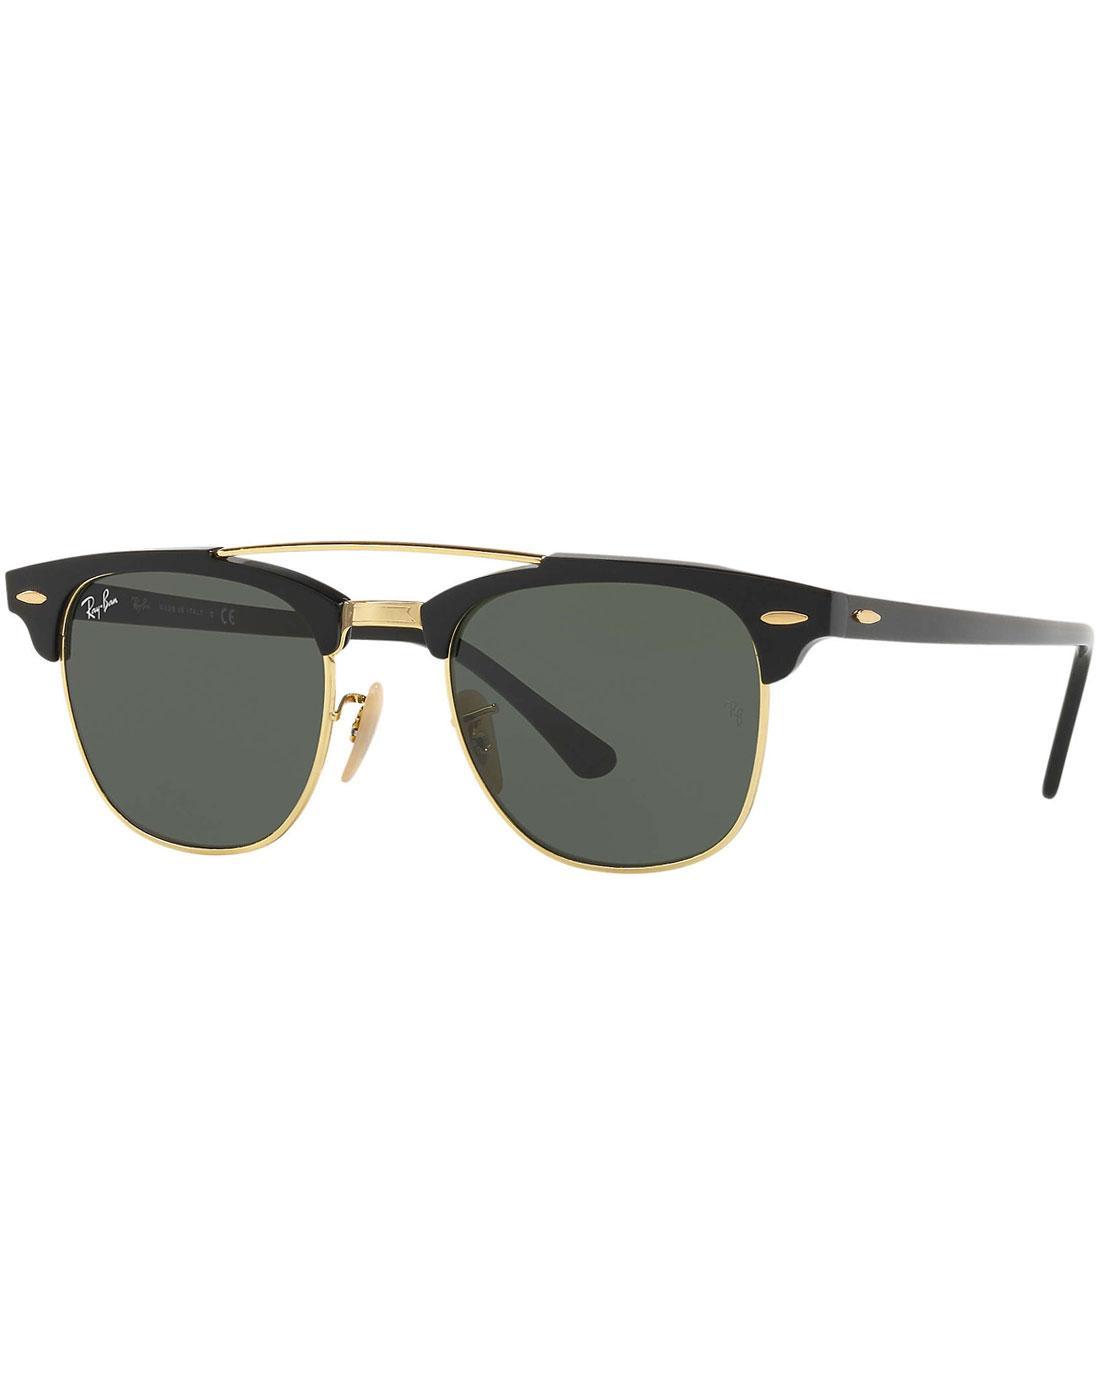 06a36b3a08 ... norway clubmaster ray ban double bridge retro sunglasses d4aed e7d15